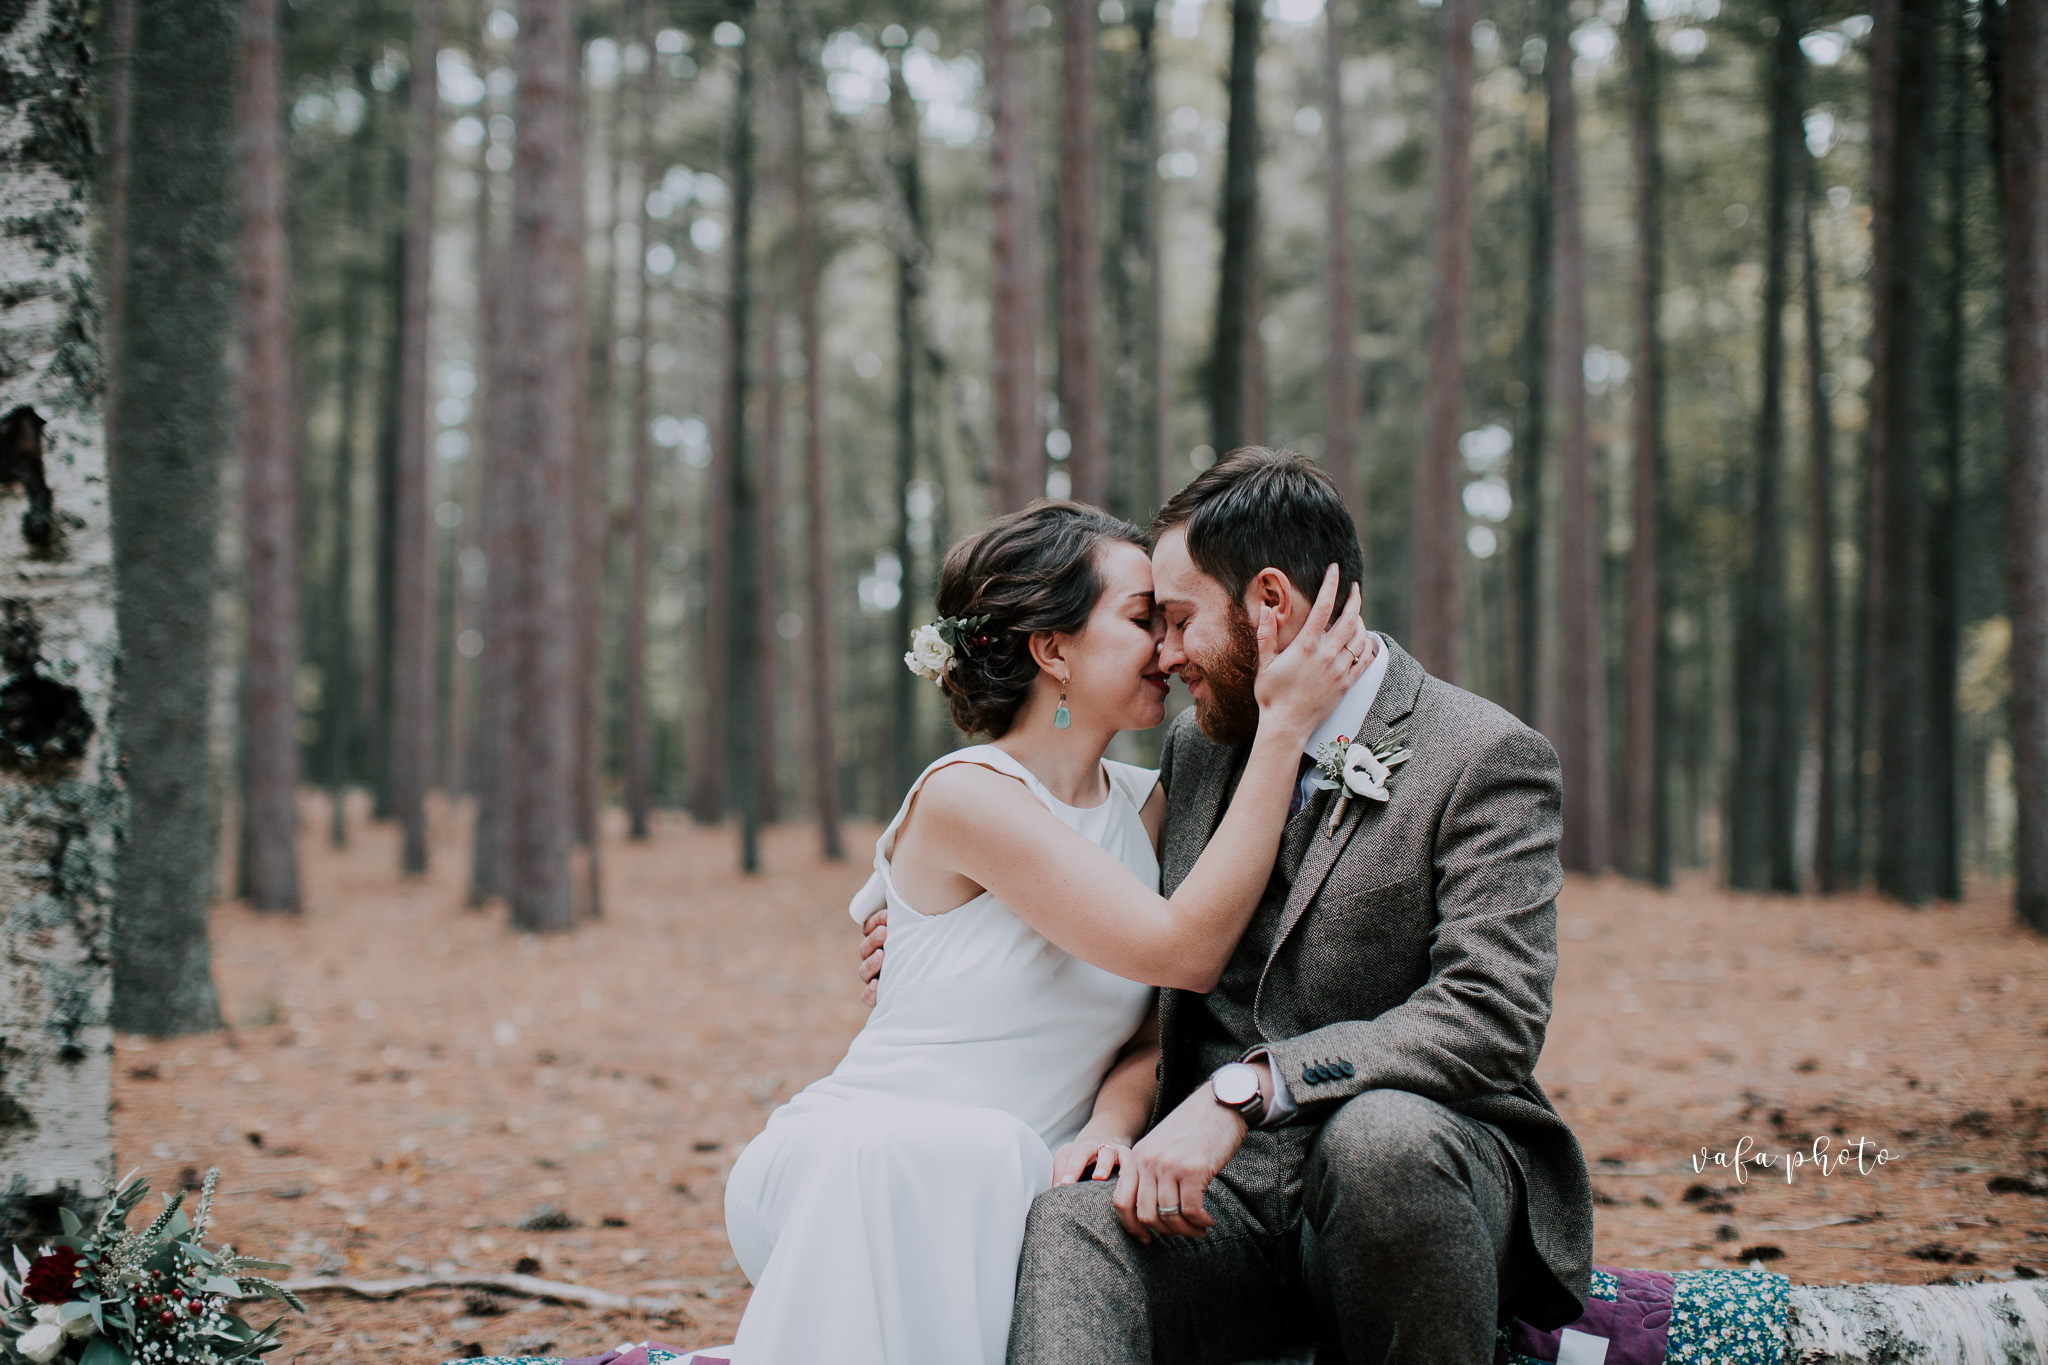 Little-Presque-Isle-Michigan-Wedding-Kim-Kyle-Vafa-Photo-412.jpg